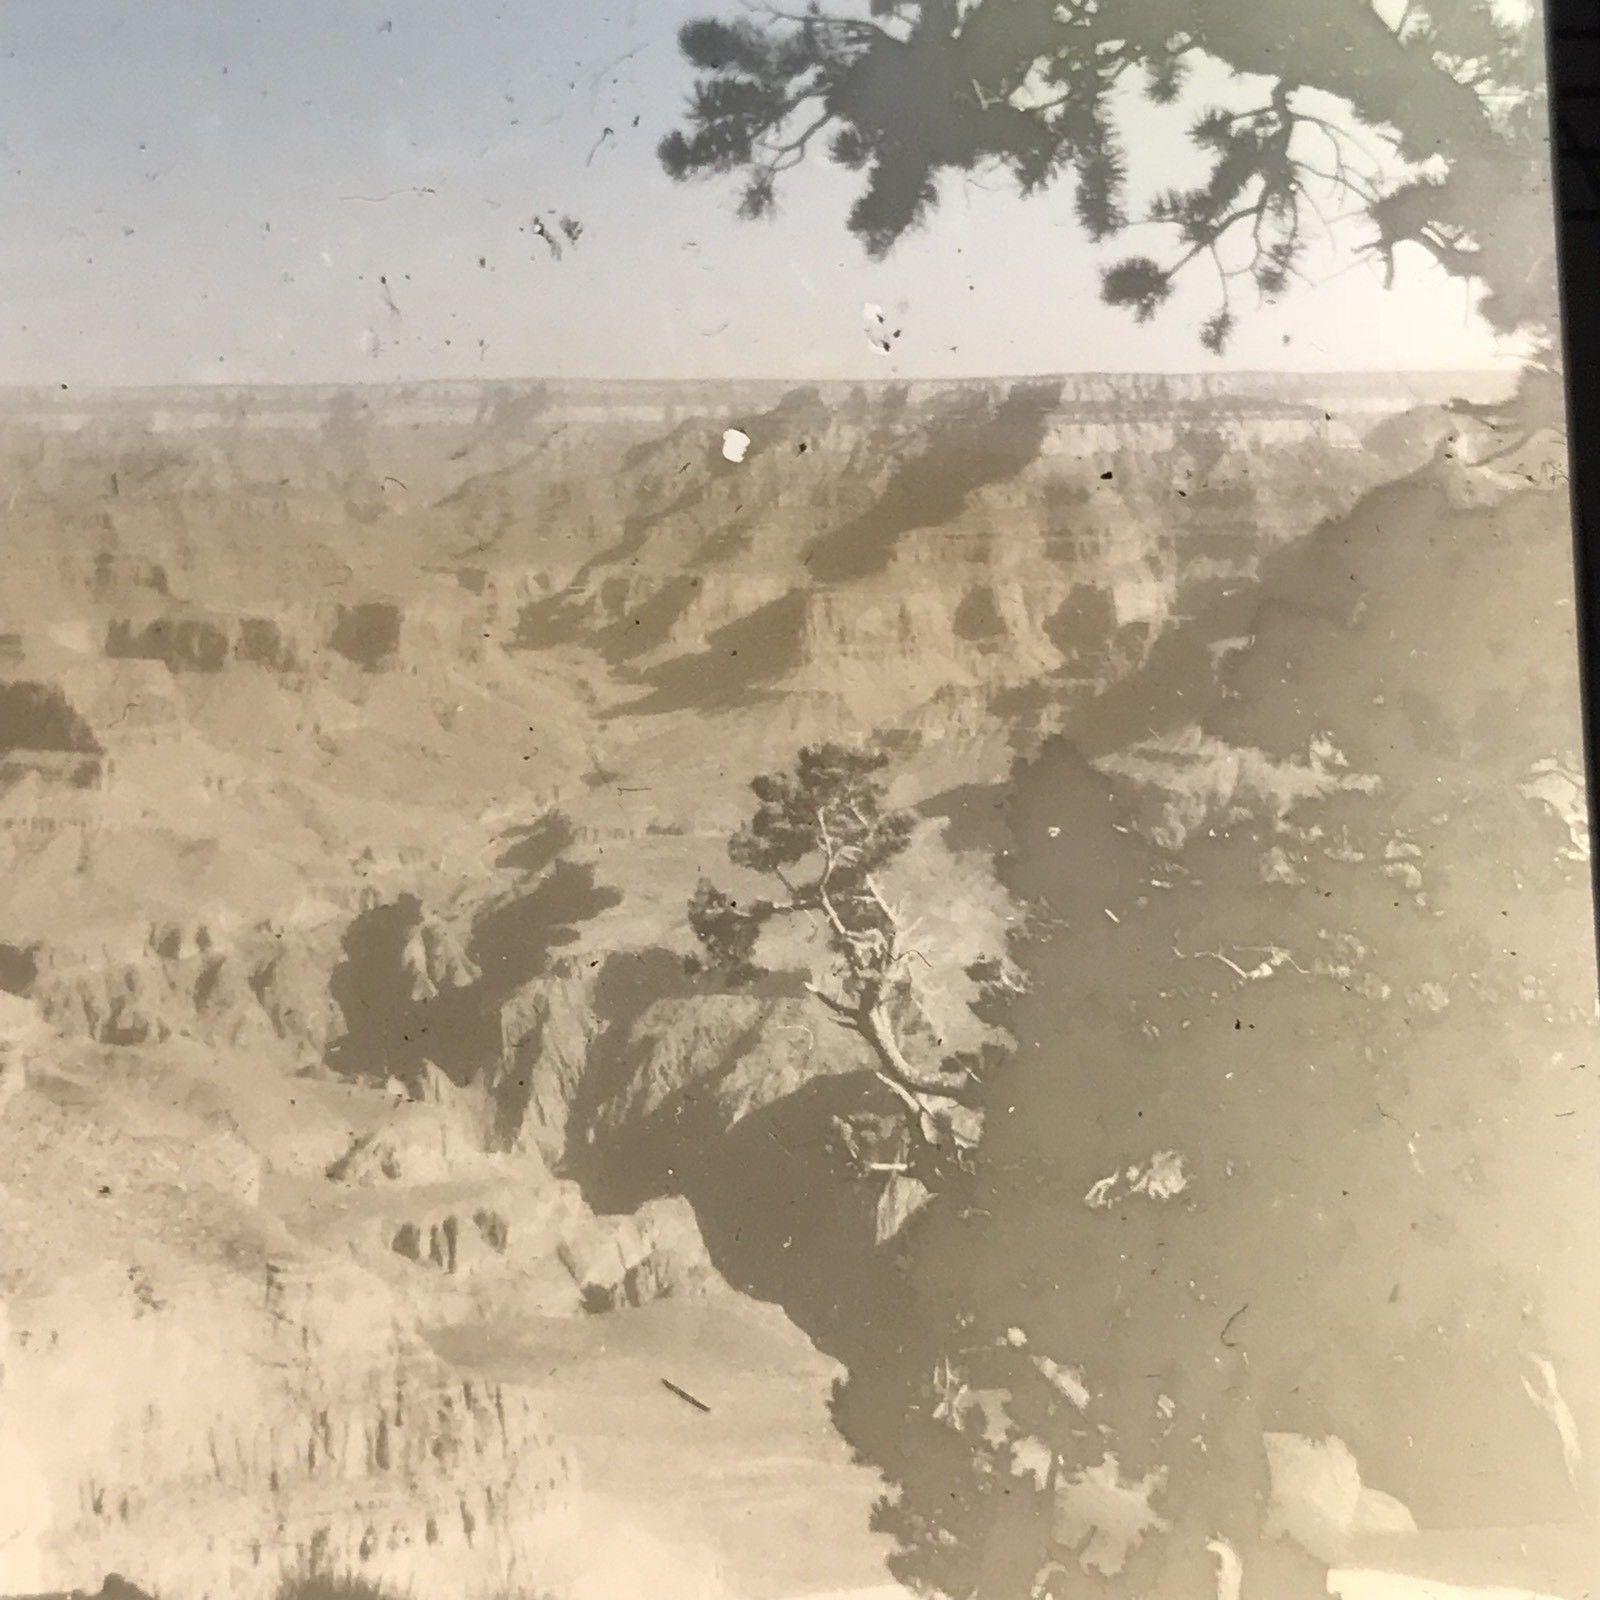 Vtg Magic Lantern Glass Slide Photo Grand Canyon AZ C1930